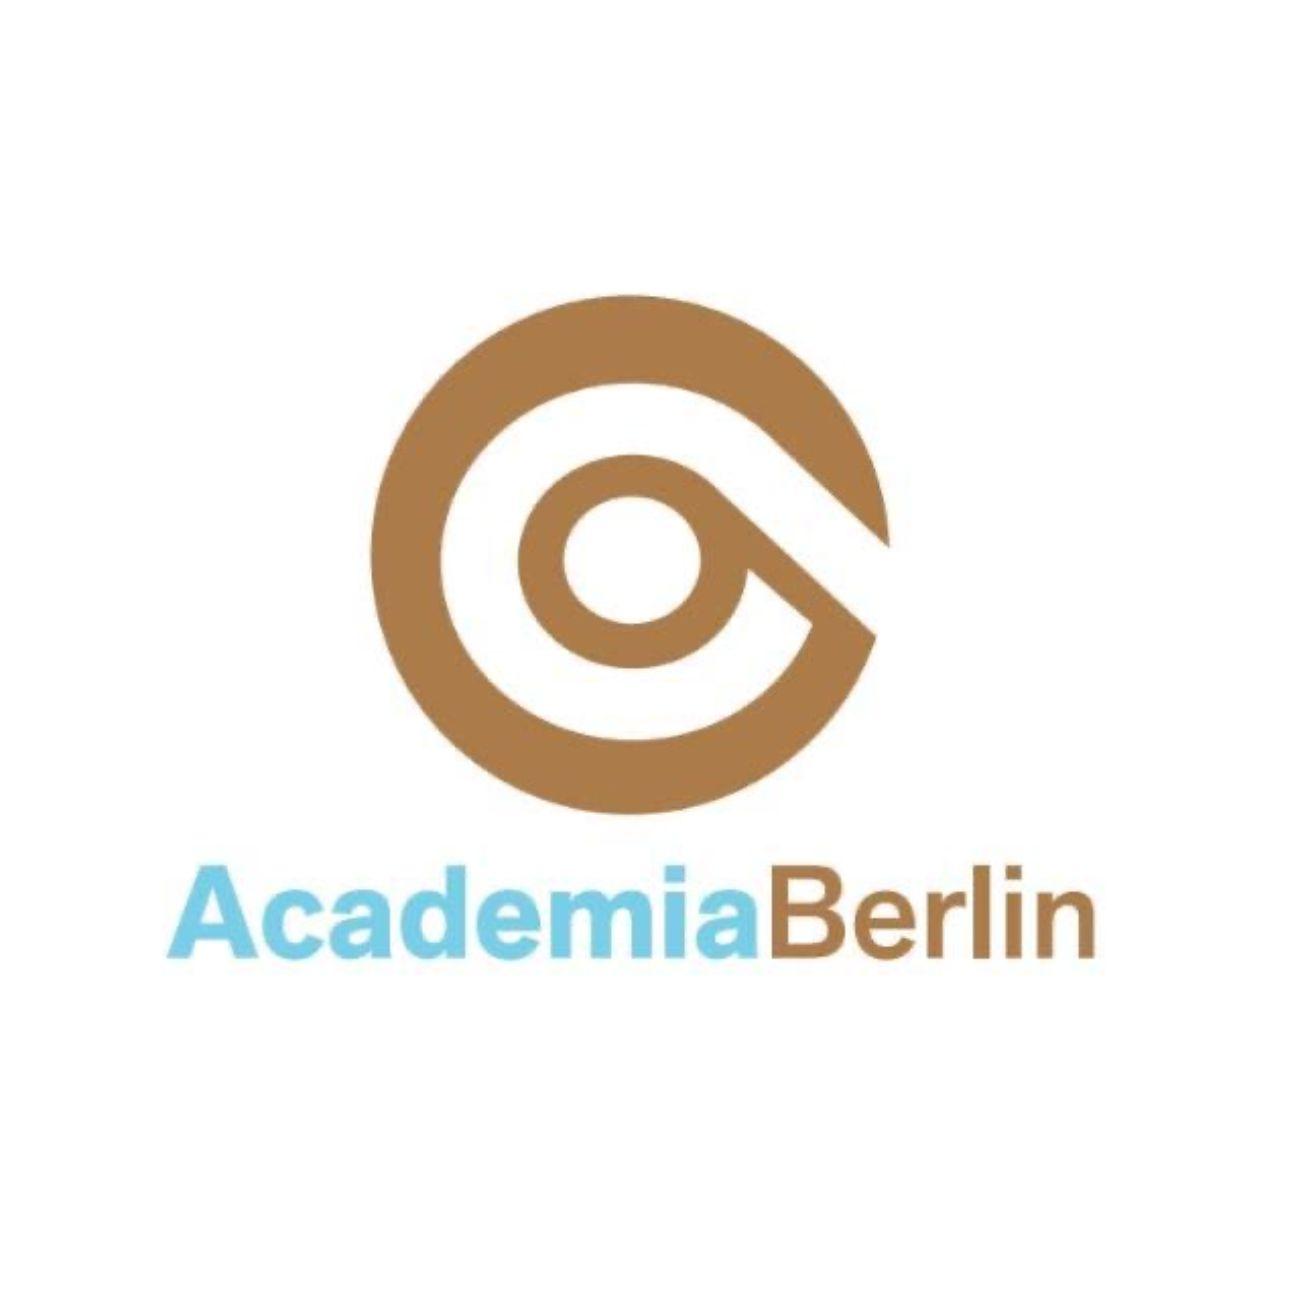 Academia Berlin